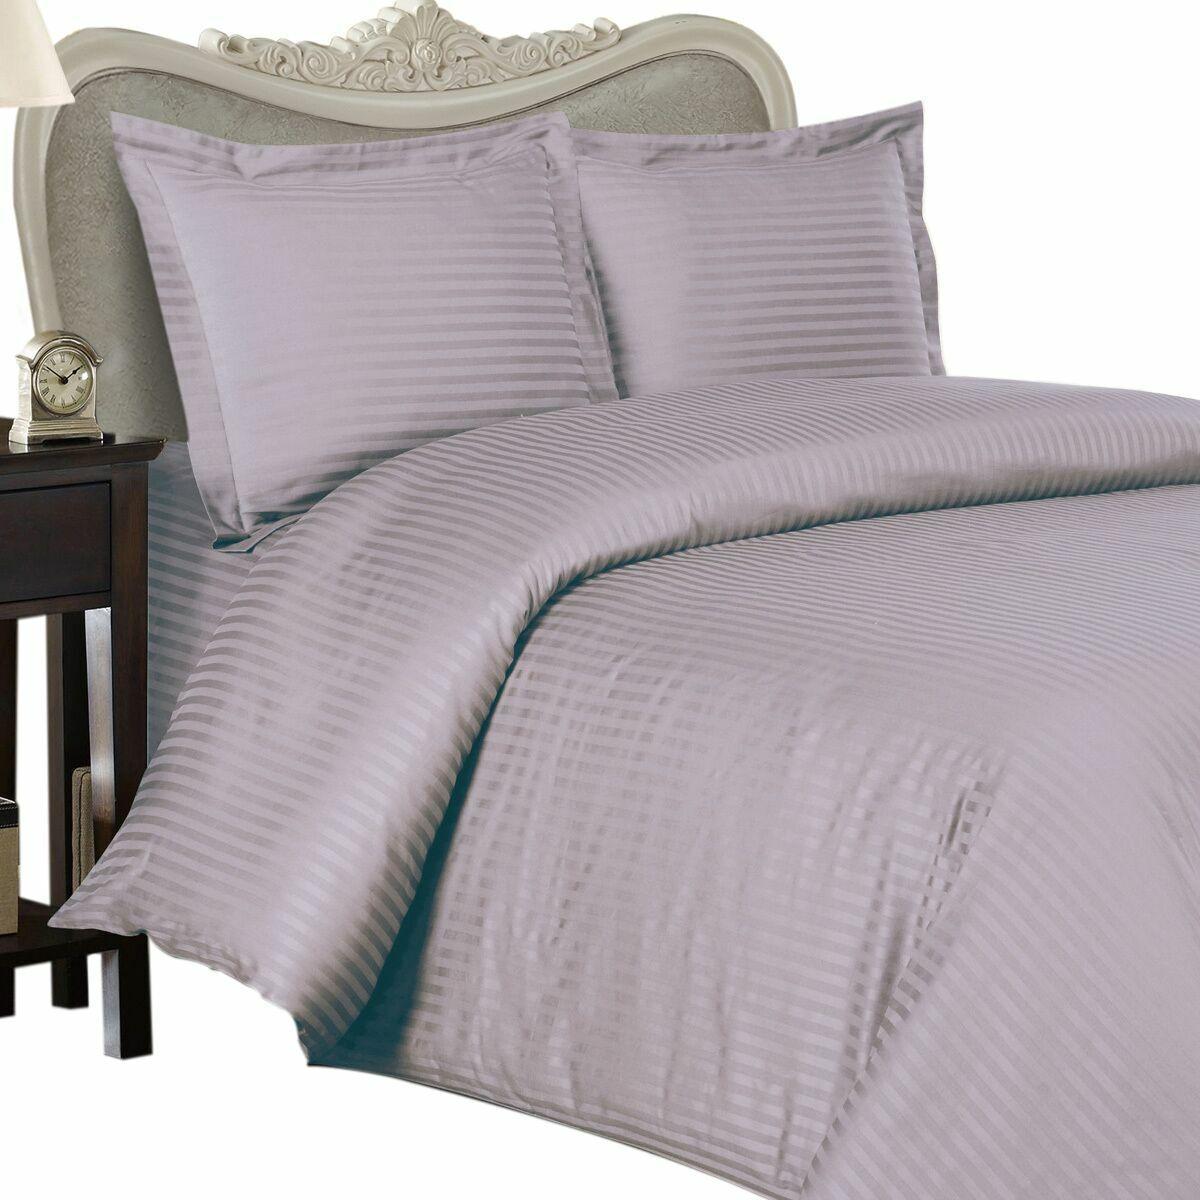 1200 Thread Count 100% Egyptian Cotton Sheet Set 1200 TC TC TC TWIN XL Lavender Stripe c1285a